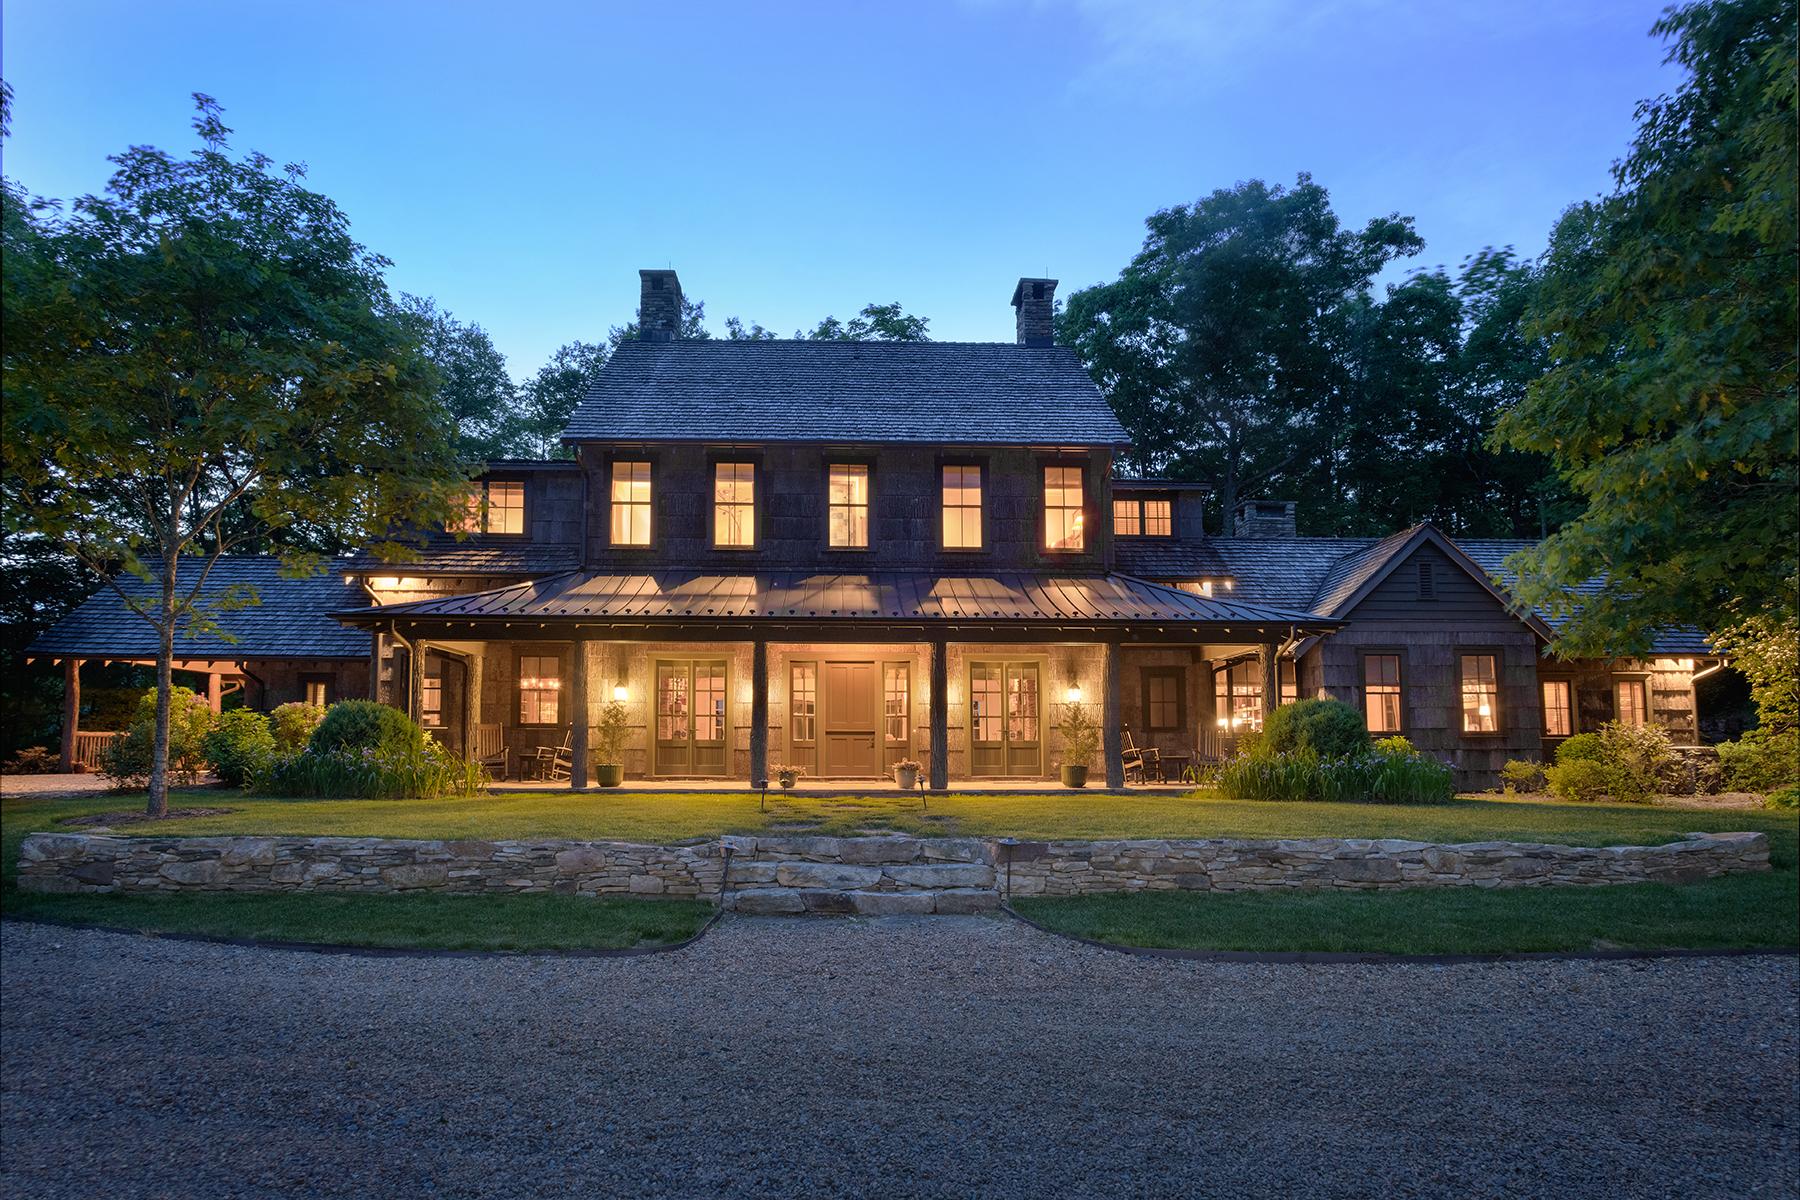 Single Family Homes 为 销售 在 TODD 649 Bald Fork Rd, Todd, 北卡罗来纳州 28684 美国